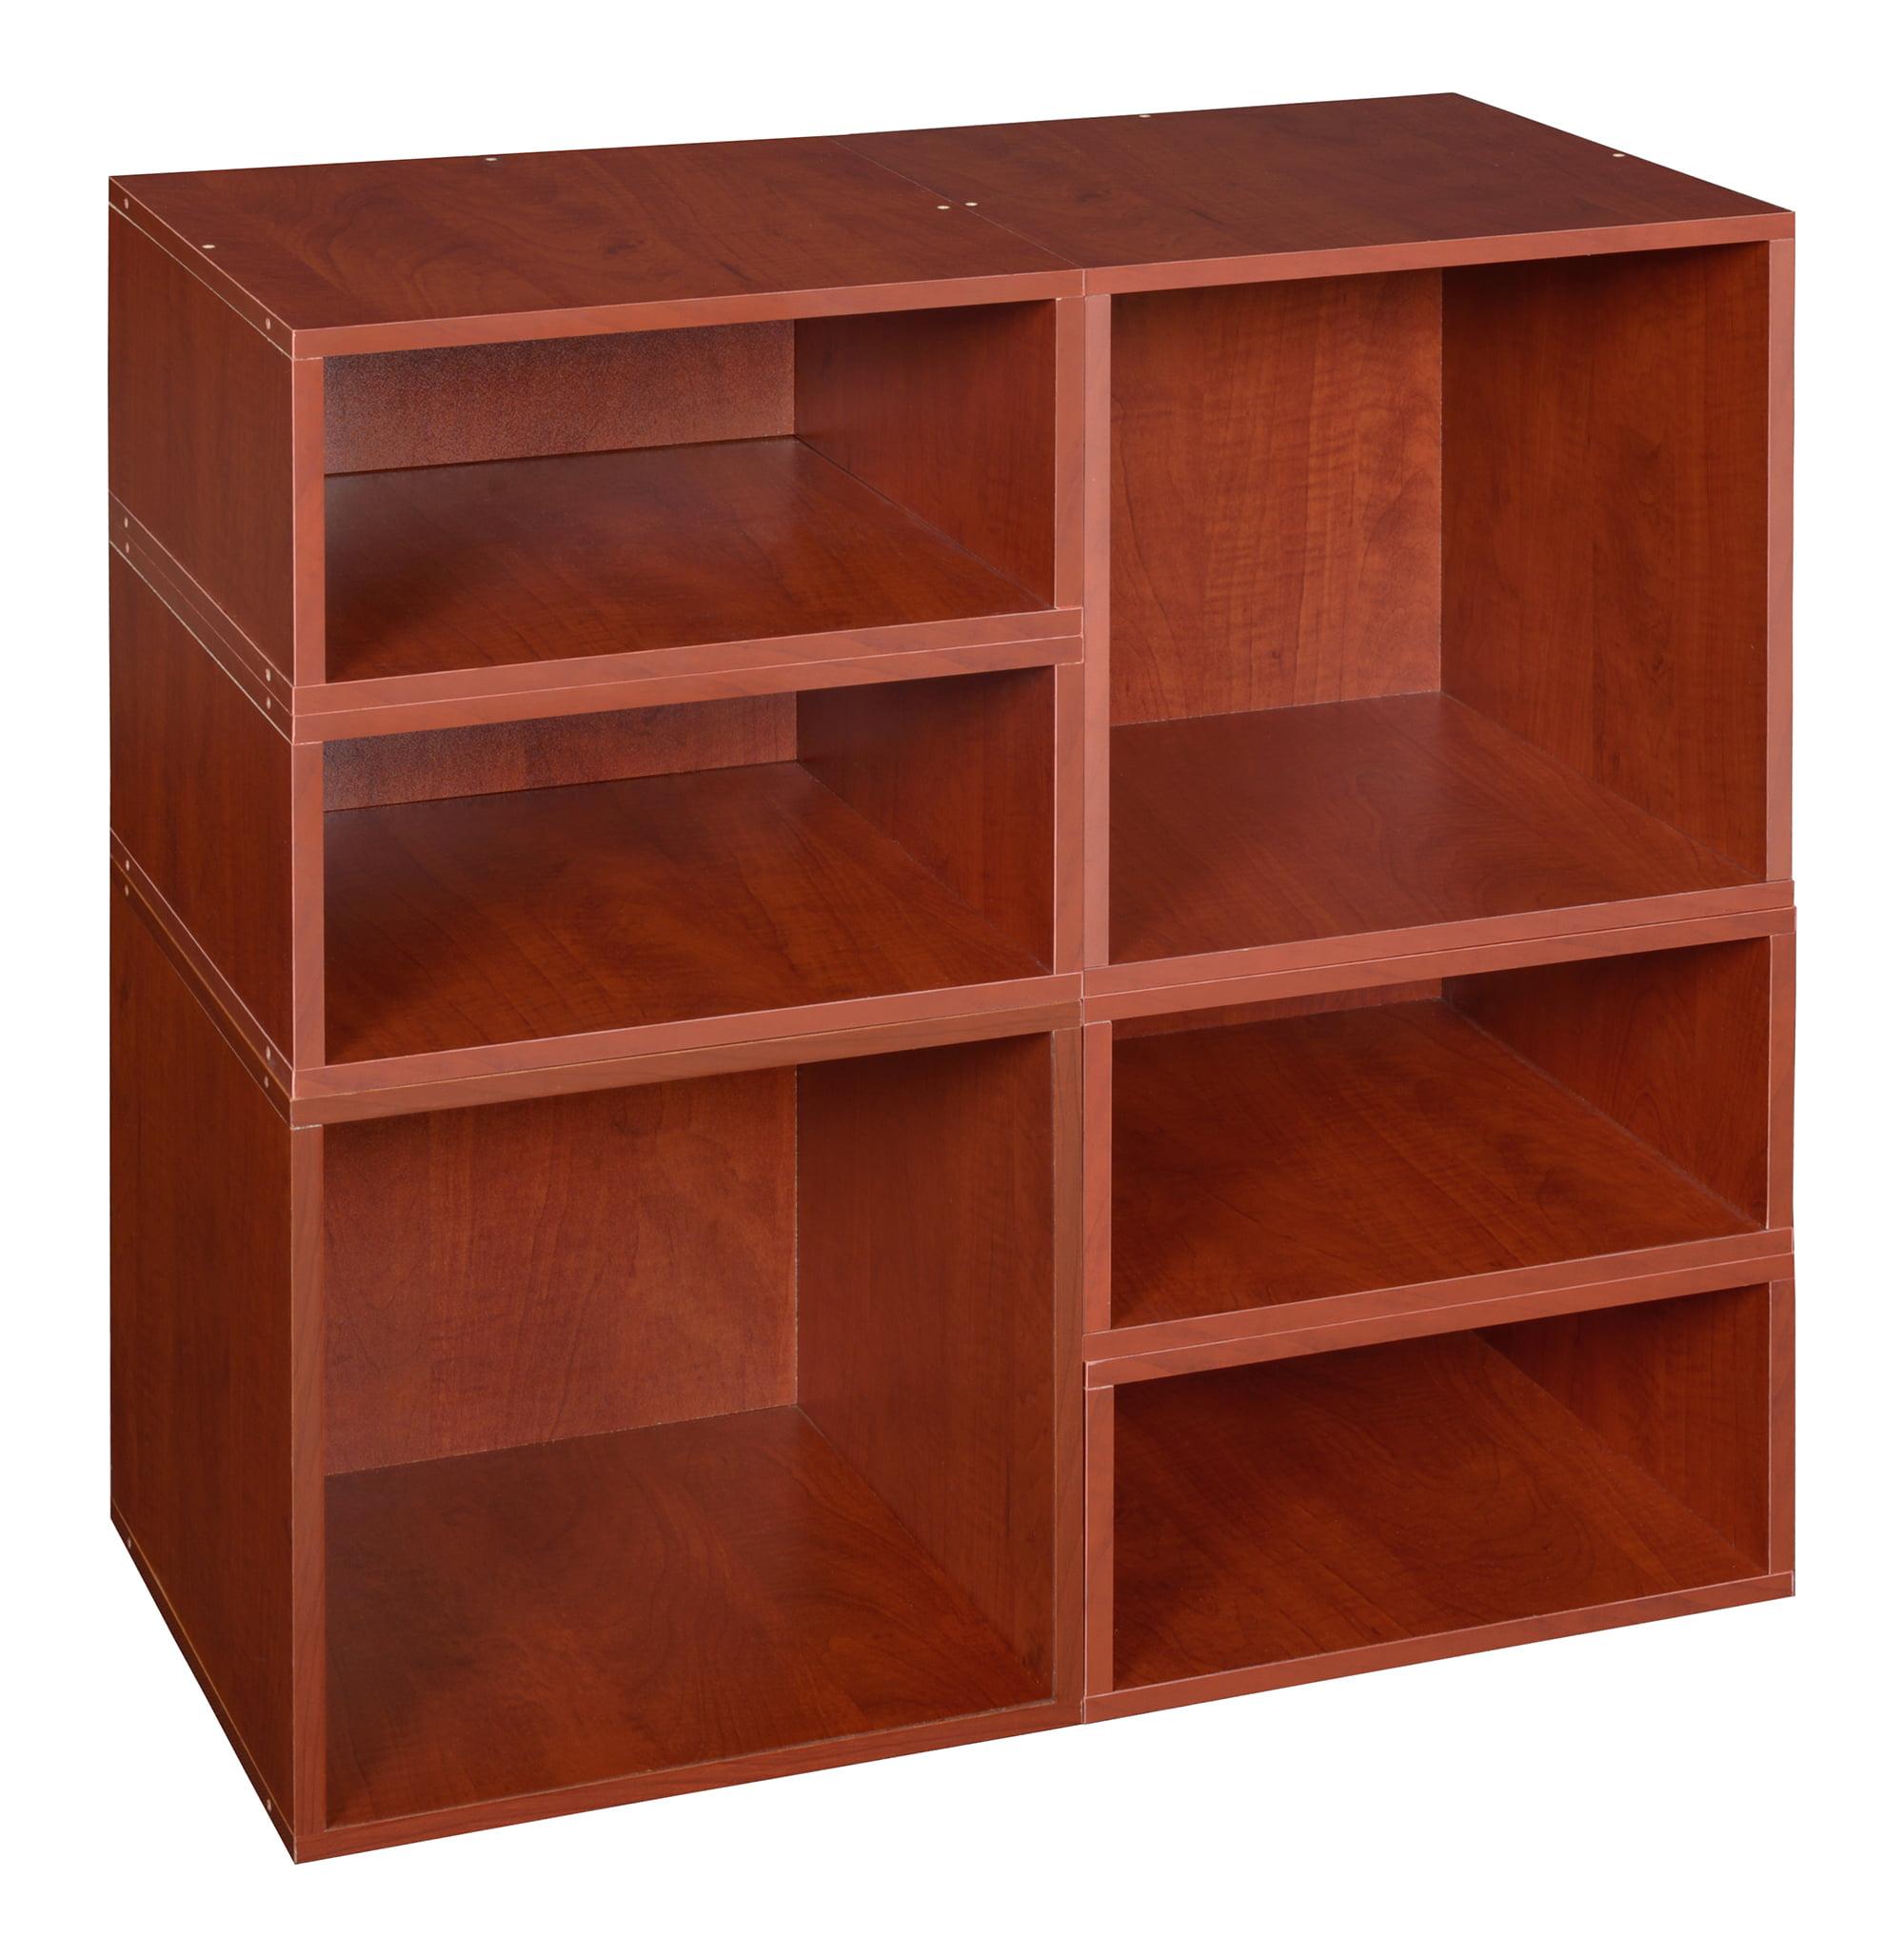 Niche Cubo Storage Set- 2 Full Cubes/4 Half Cubes- Cherry